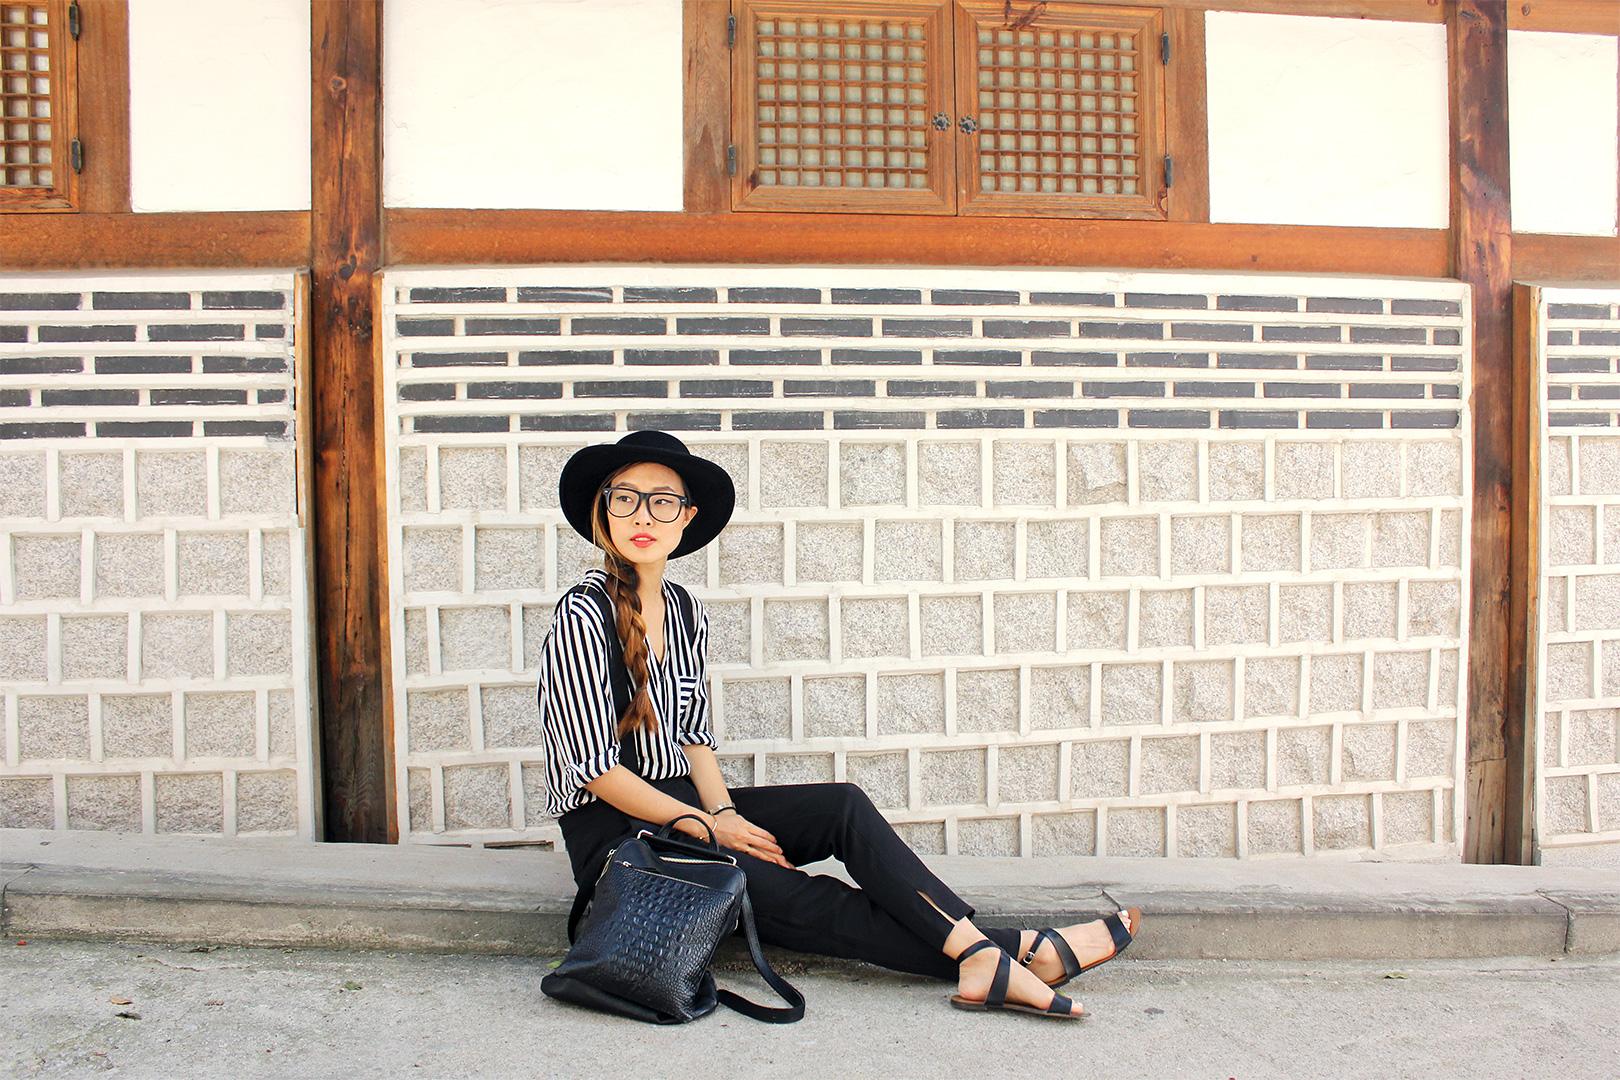 Tobi overalls, Stylenanda hat, Zara shirt, J.Crew sandals